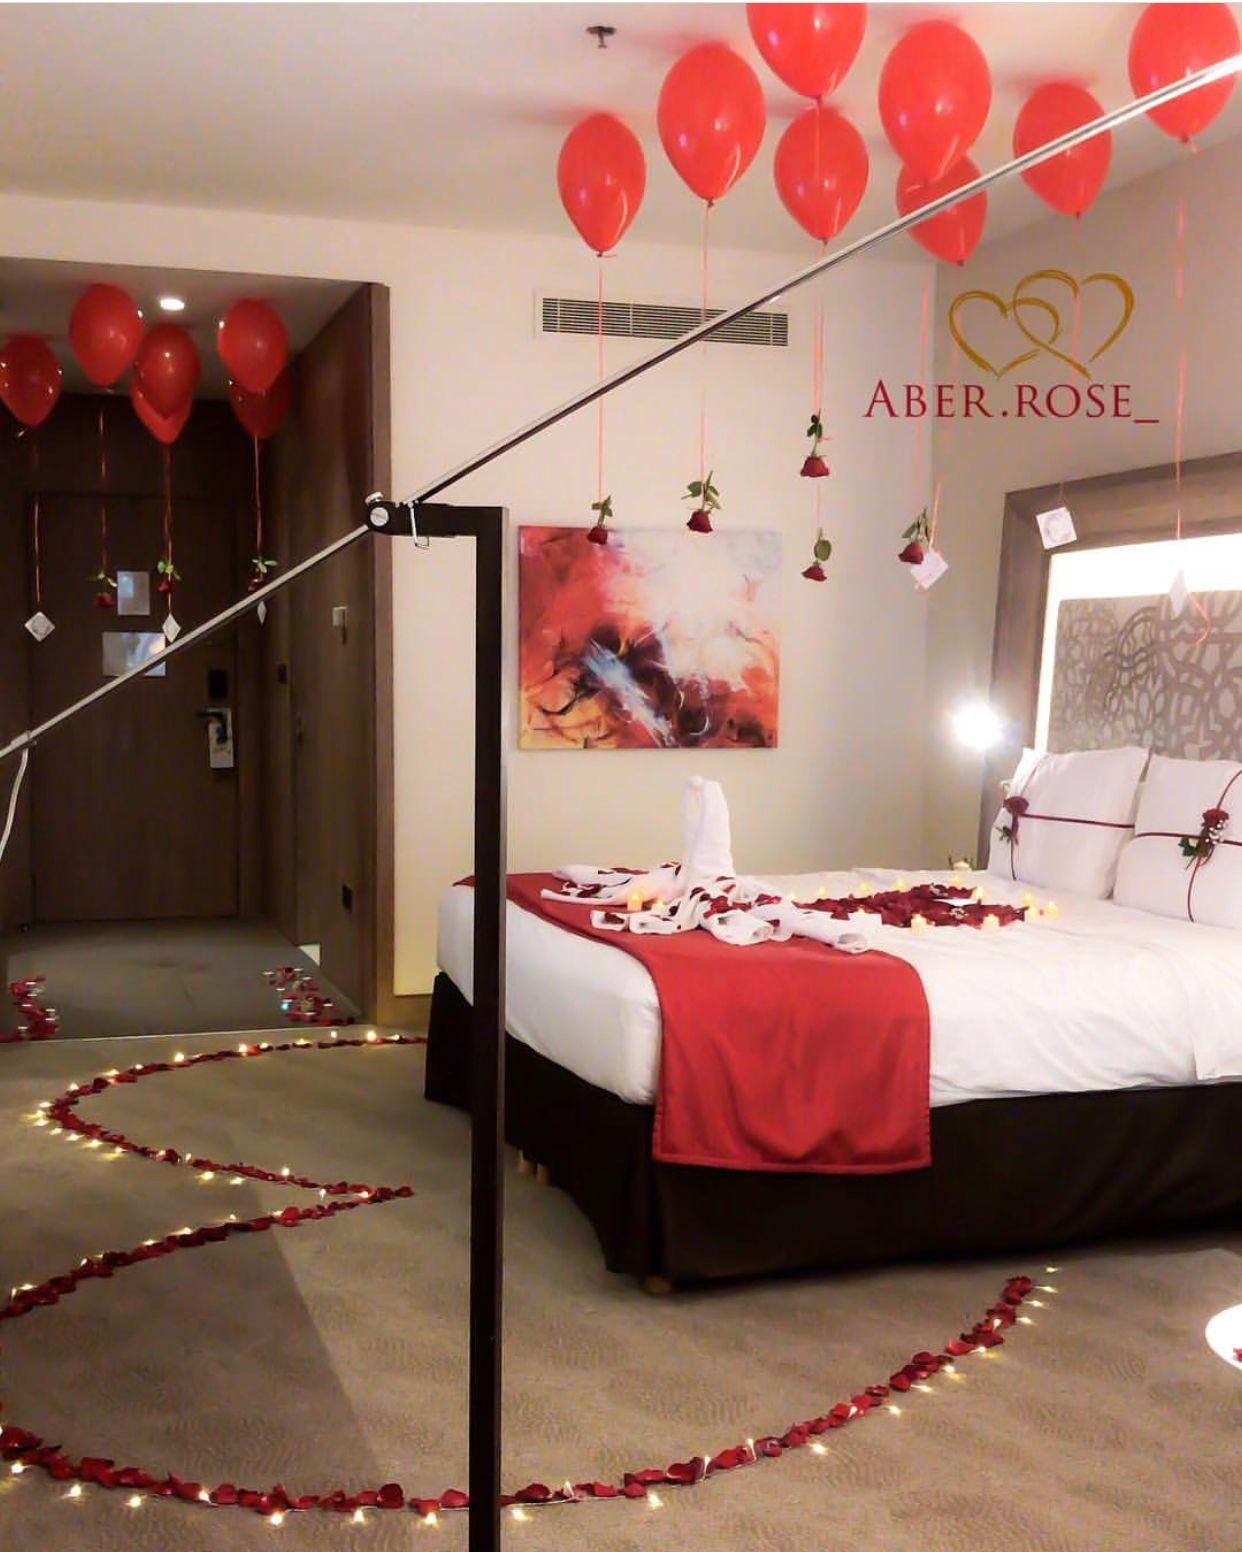 Pin By Ghada Salih On Romance Valentines Bedroom Wedding Bedroom Wedding Night Room Decorations